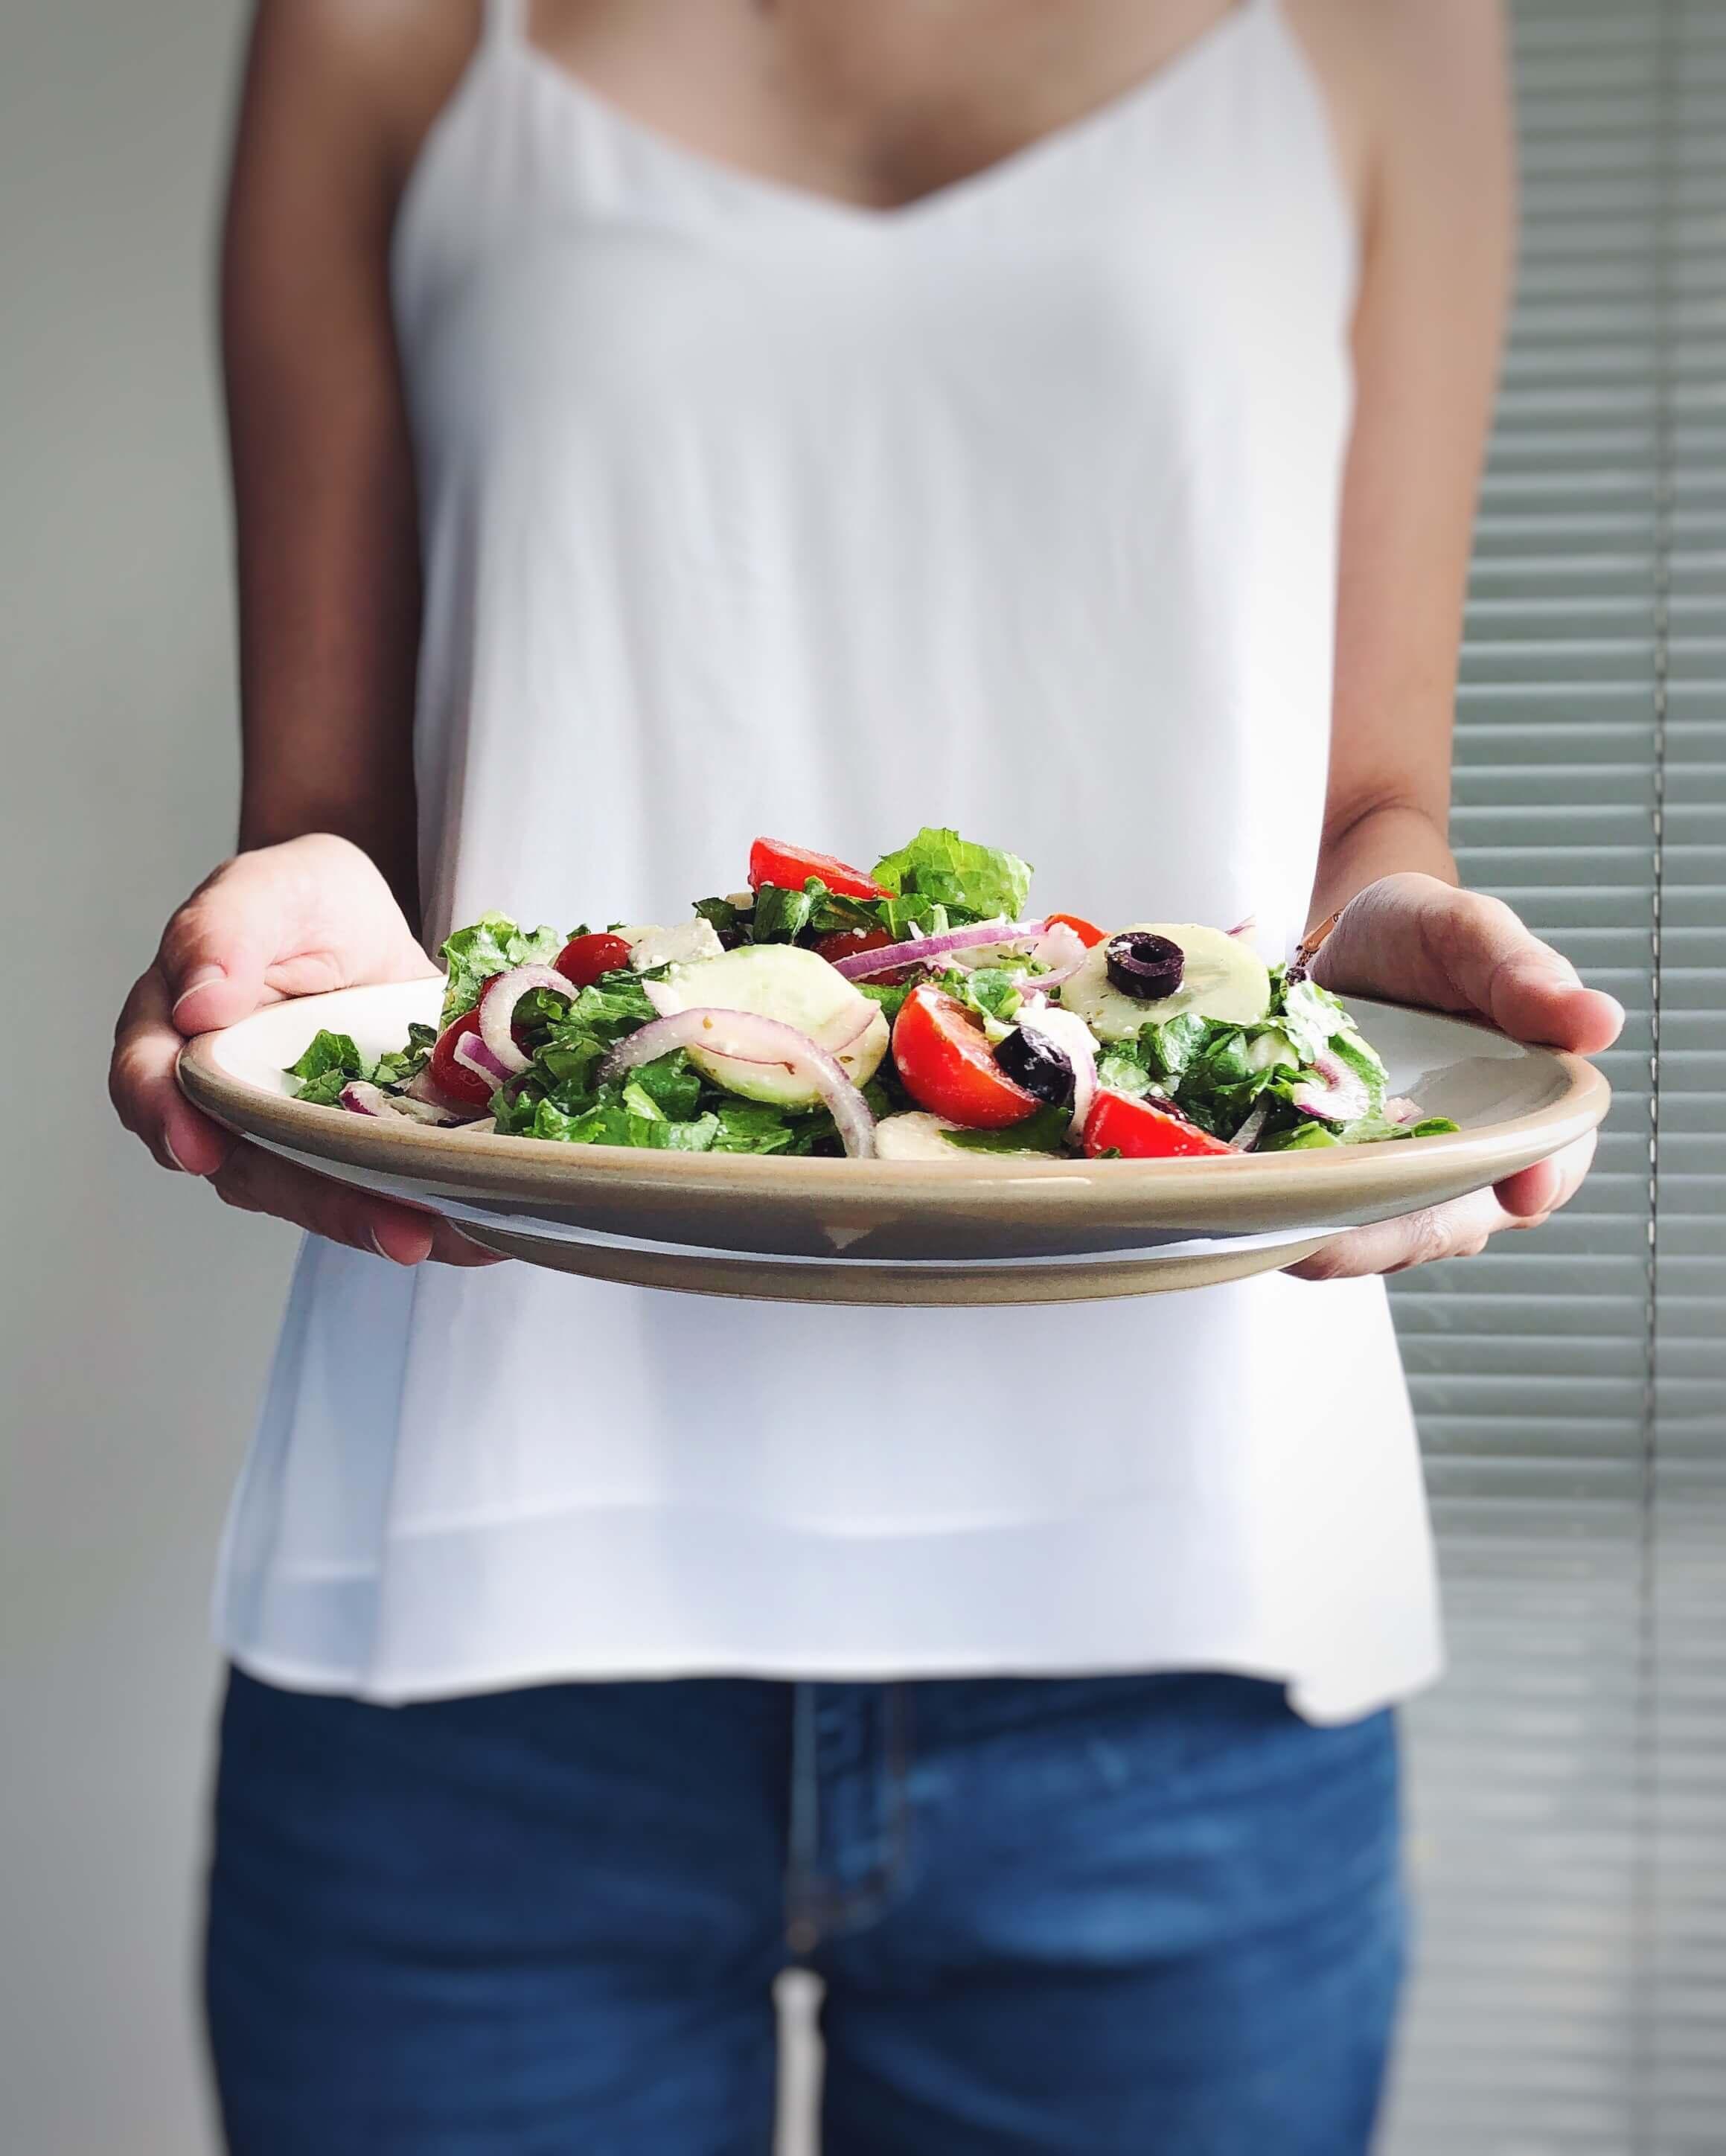 Grčka salata kao kompletan obrok